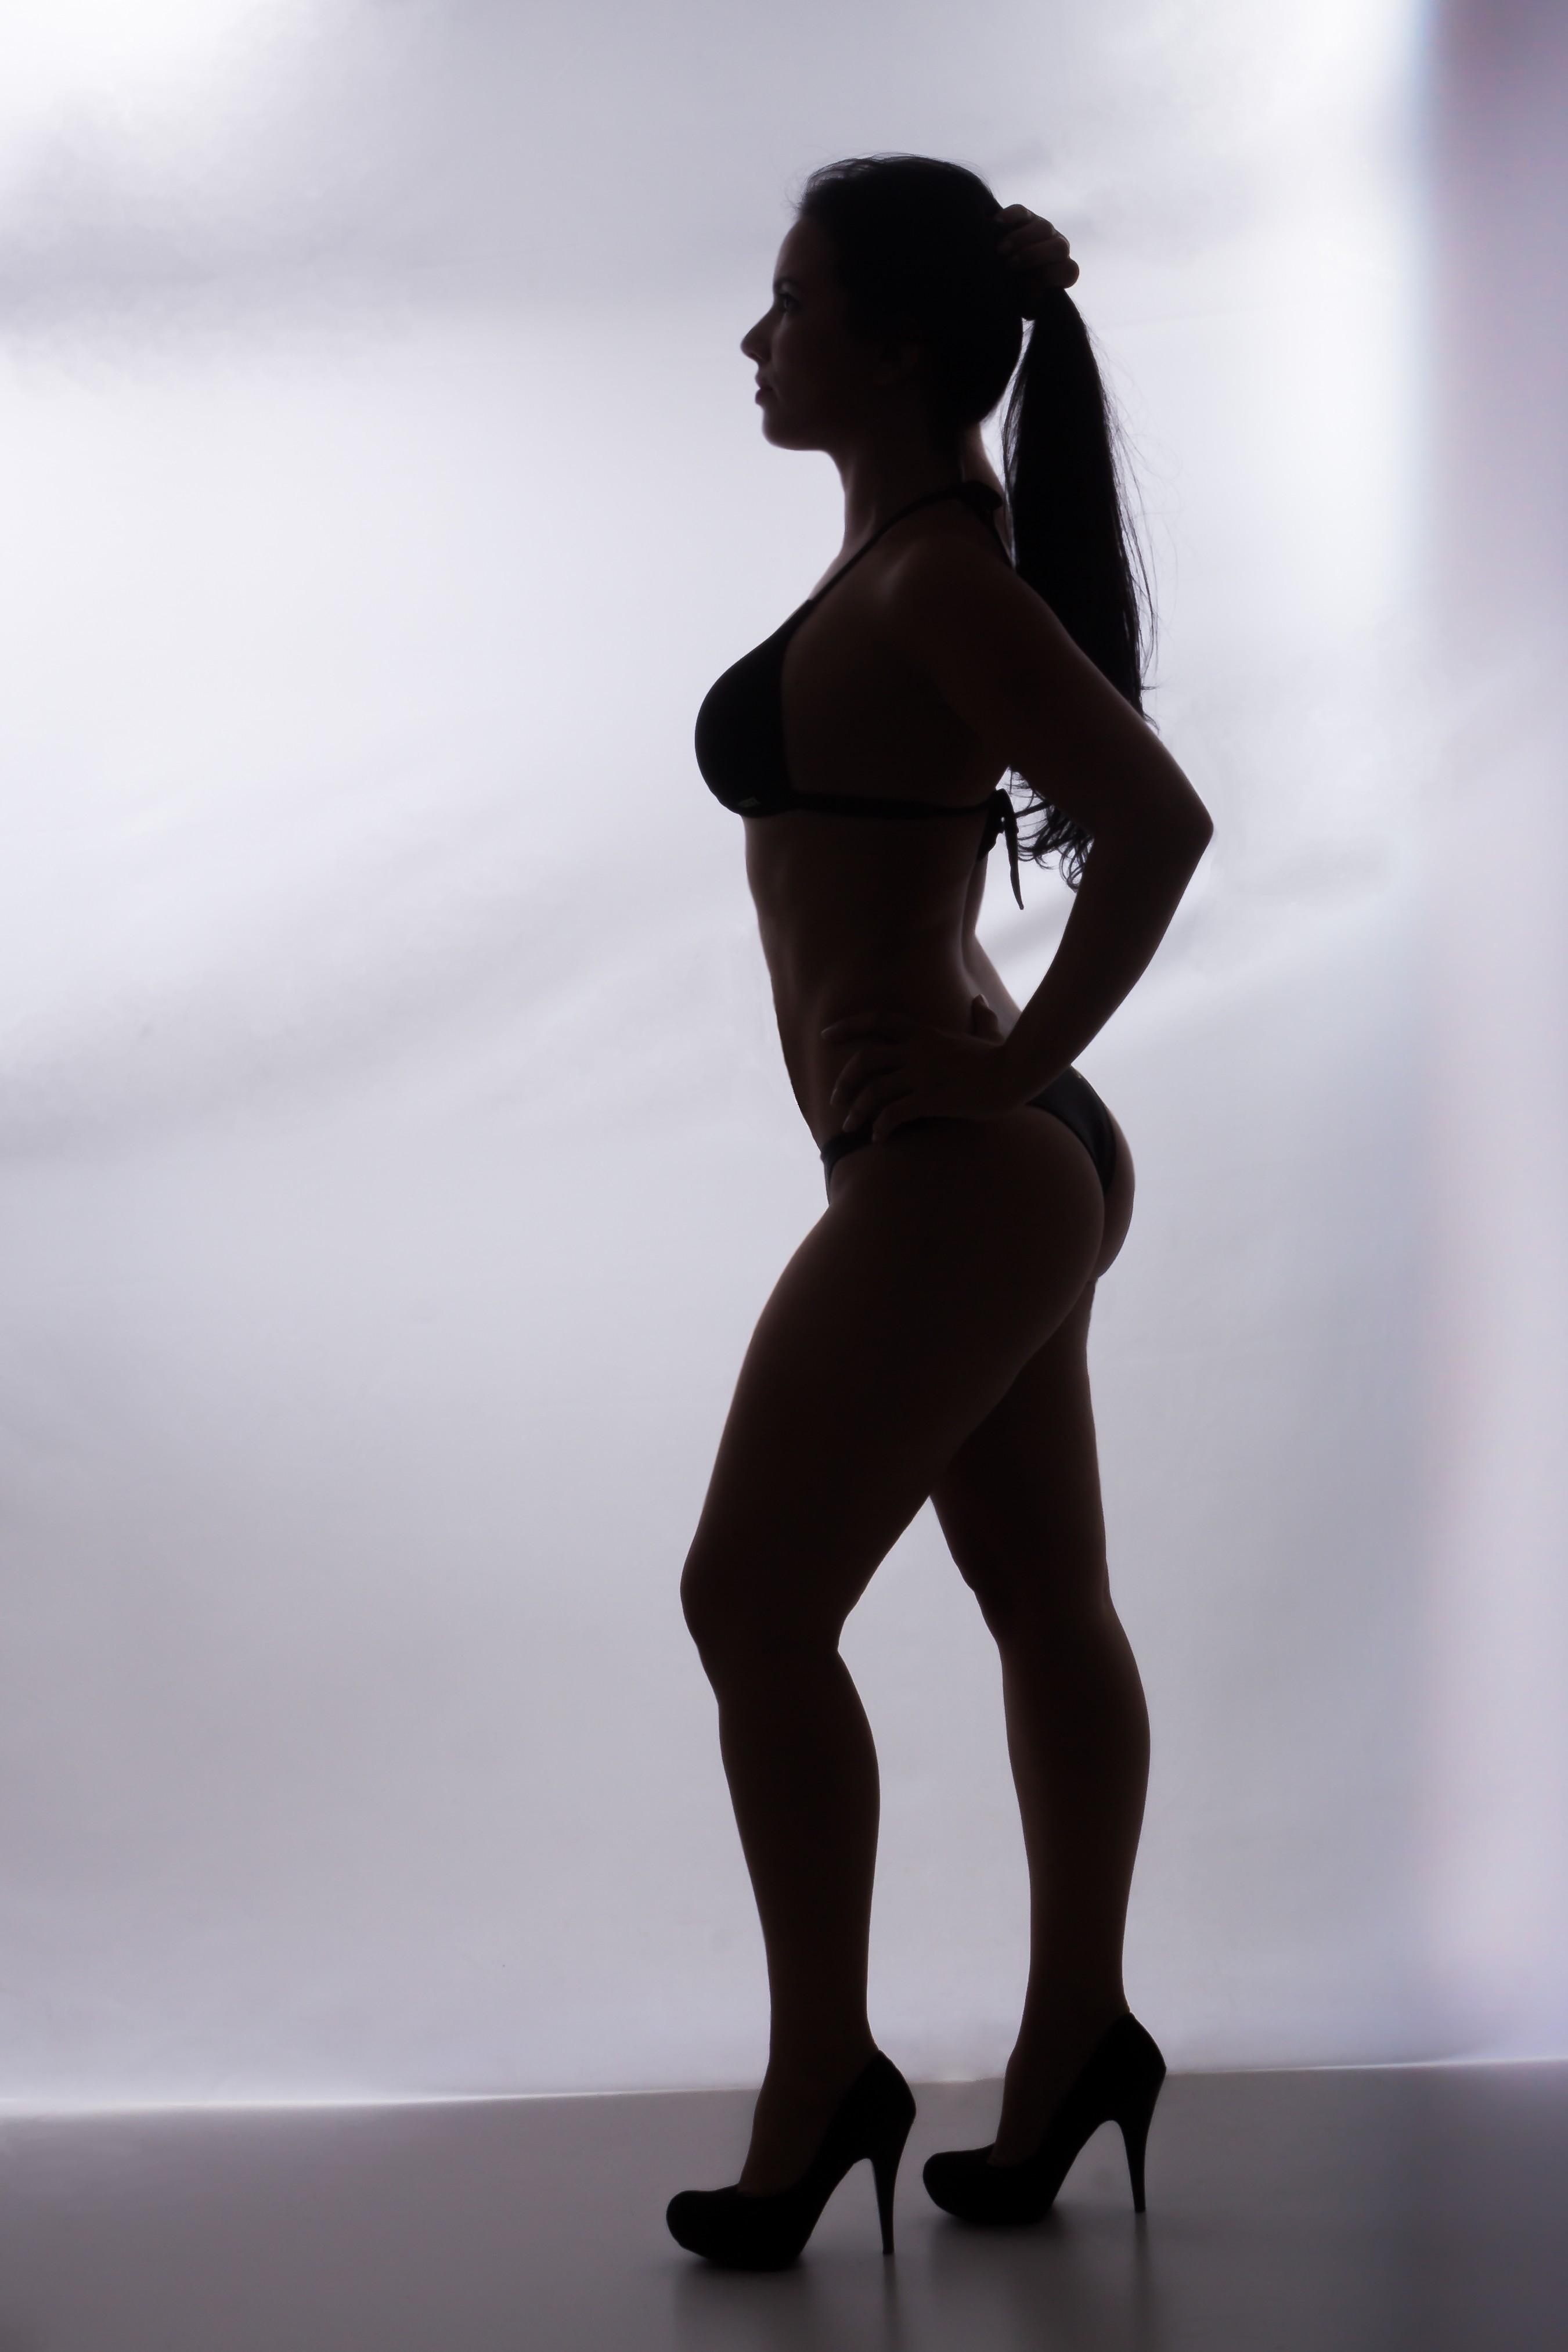 Priscila Giraldi